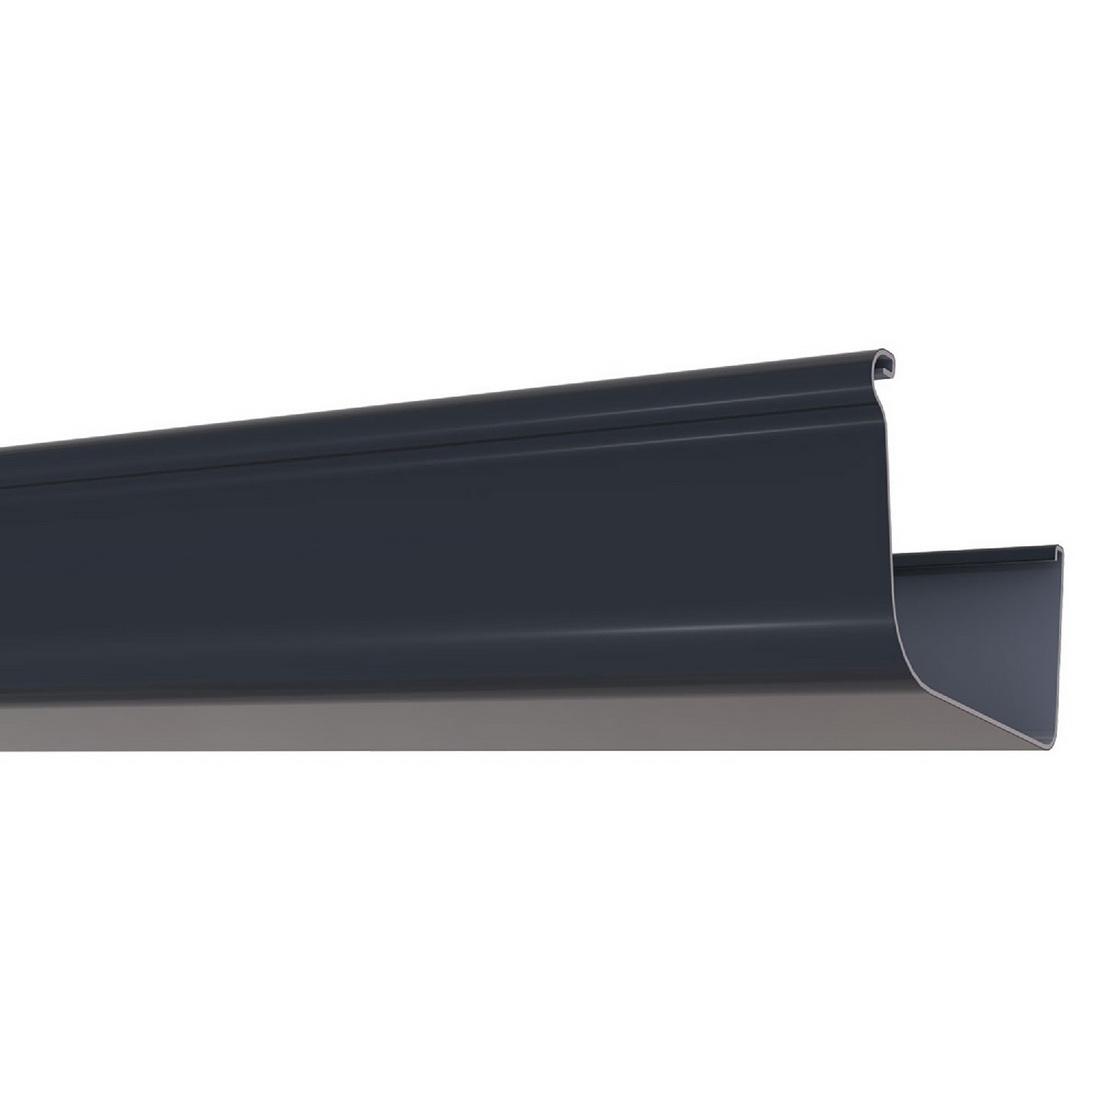 Stormcloud Stratus Design Series 4m Spouting Black